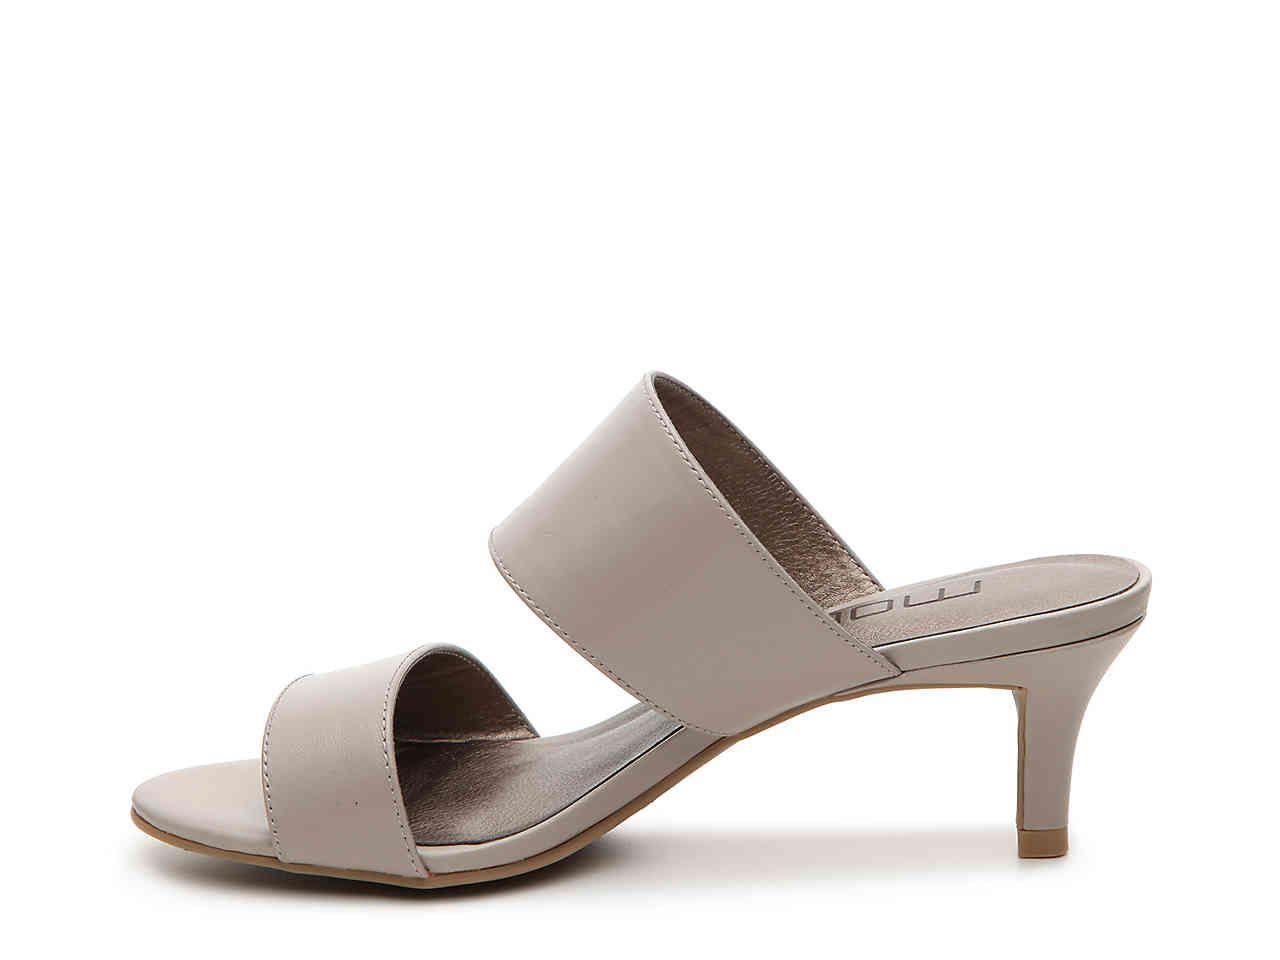 334b710ee403 Moda Spana May Sandal Women s Shoes